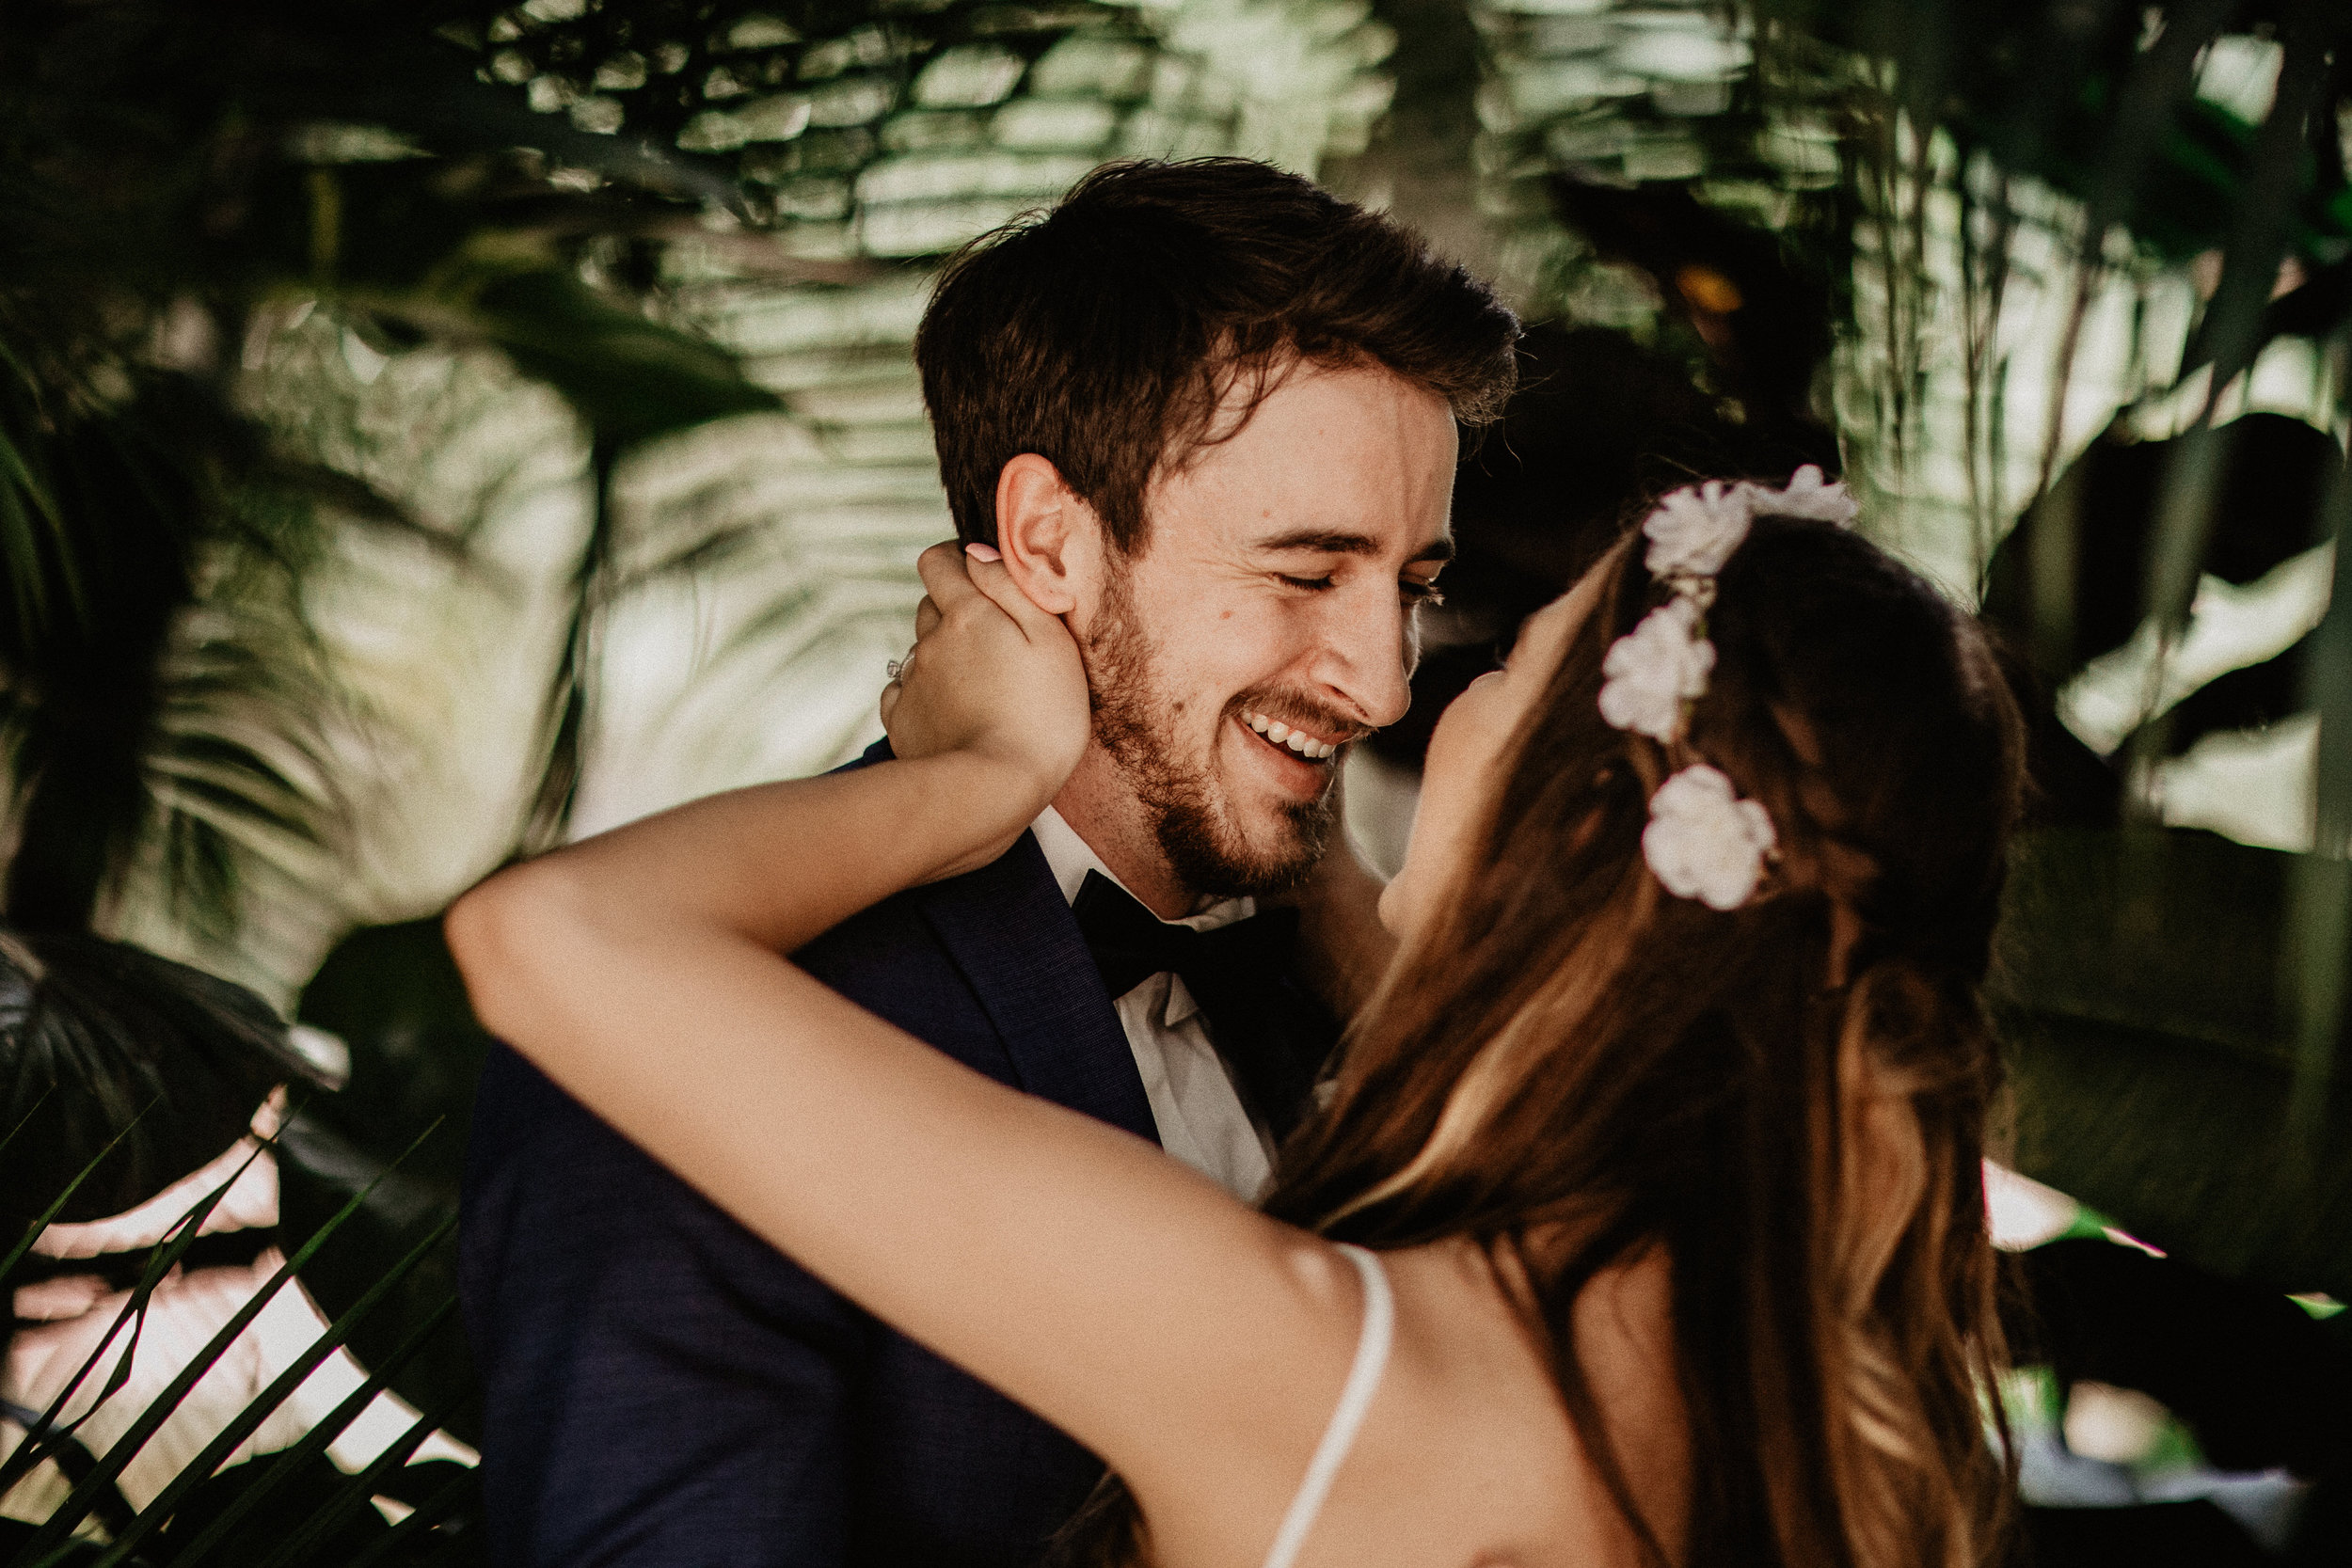 alfonso_flores_destination_wedding_photography_puerto_vallarta_hotel_barcelo_vallarta_cuttler_amela-305.JPG